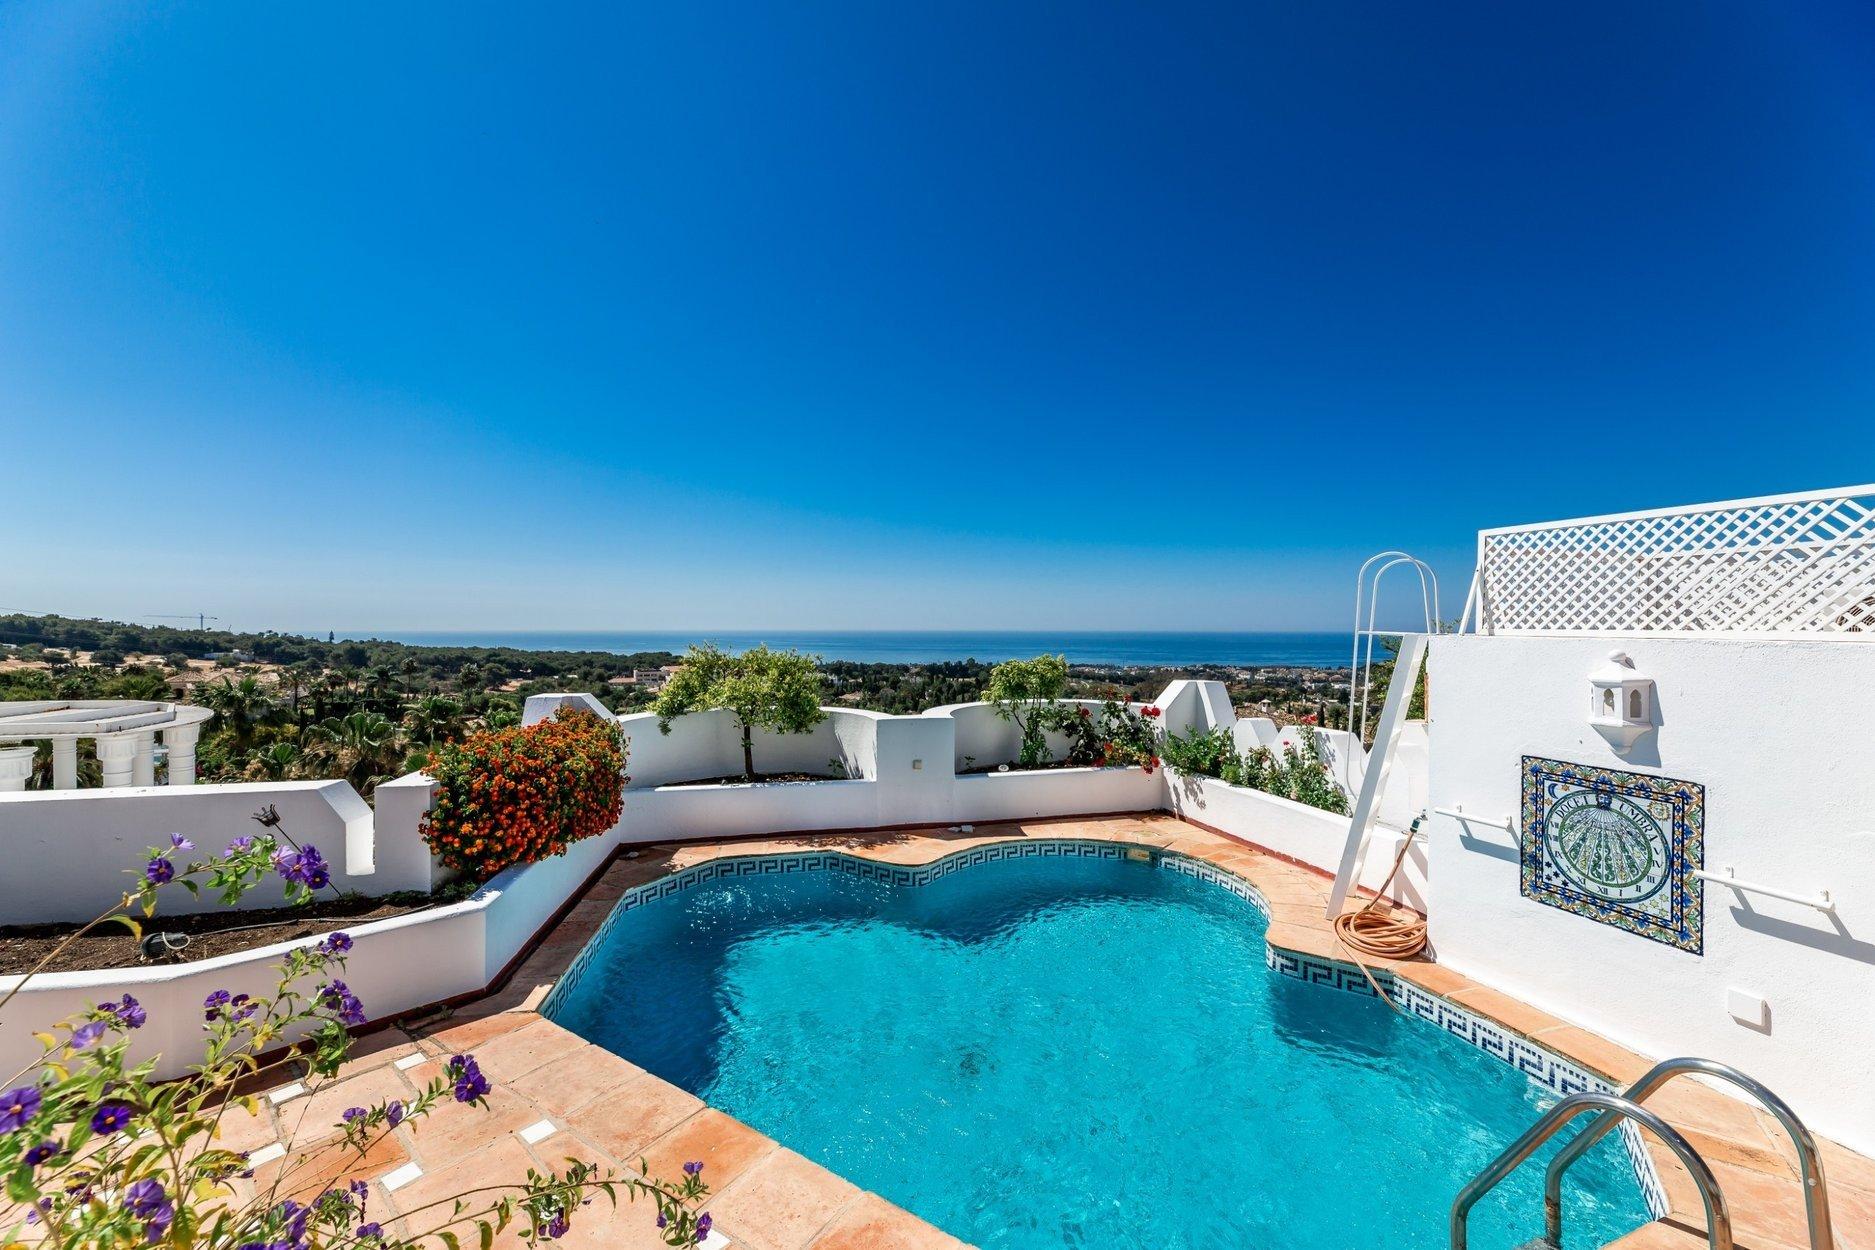 Penthouse for sale in Marbella, Jardines Colgantes